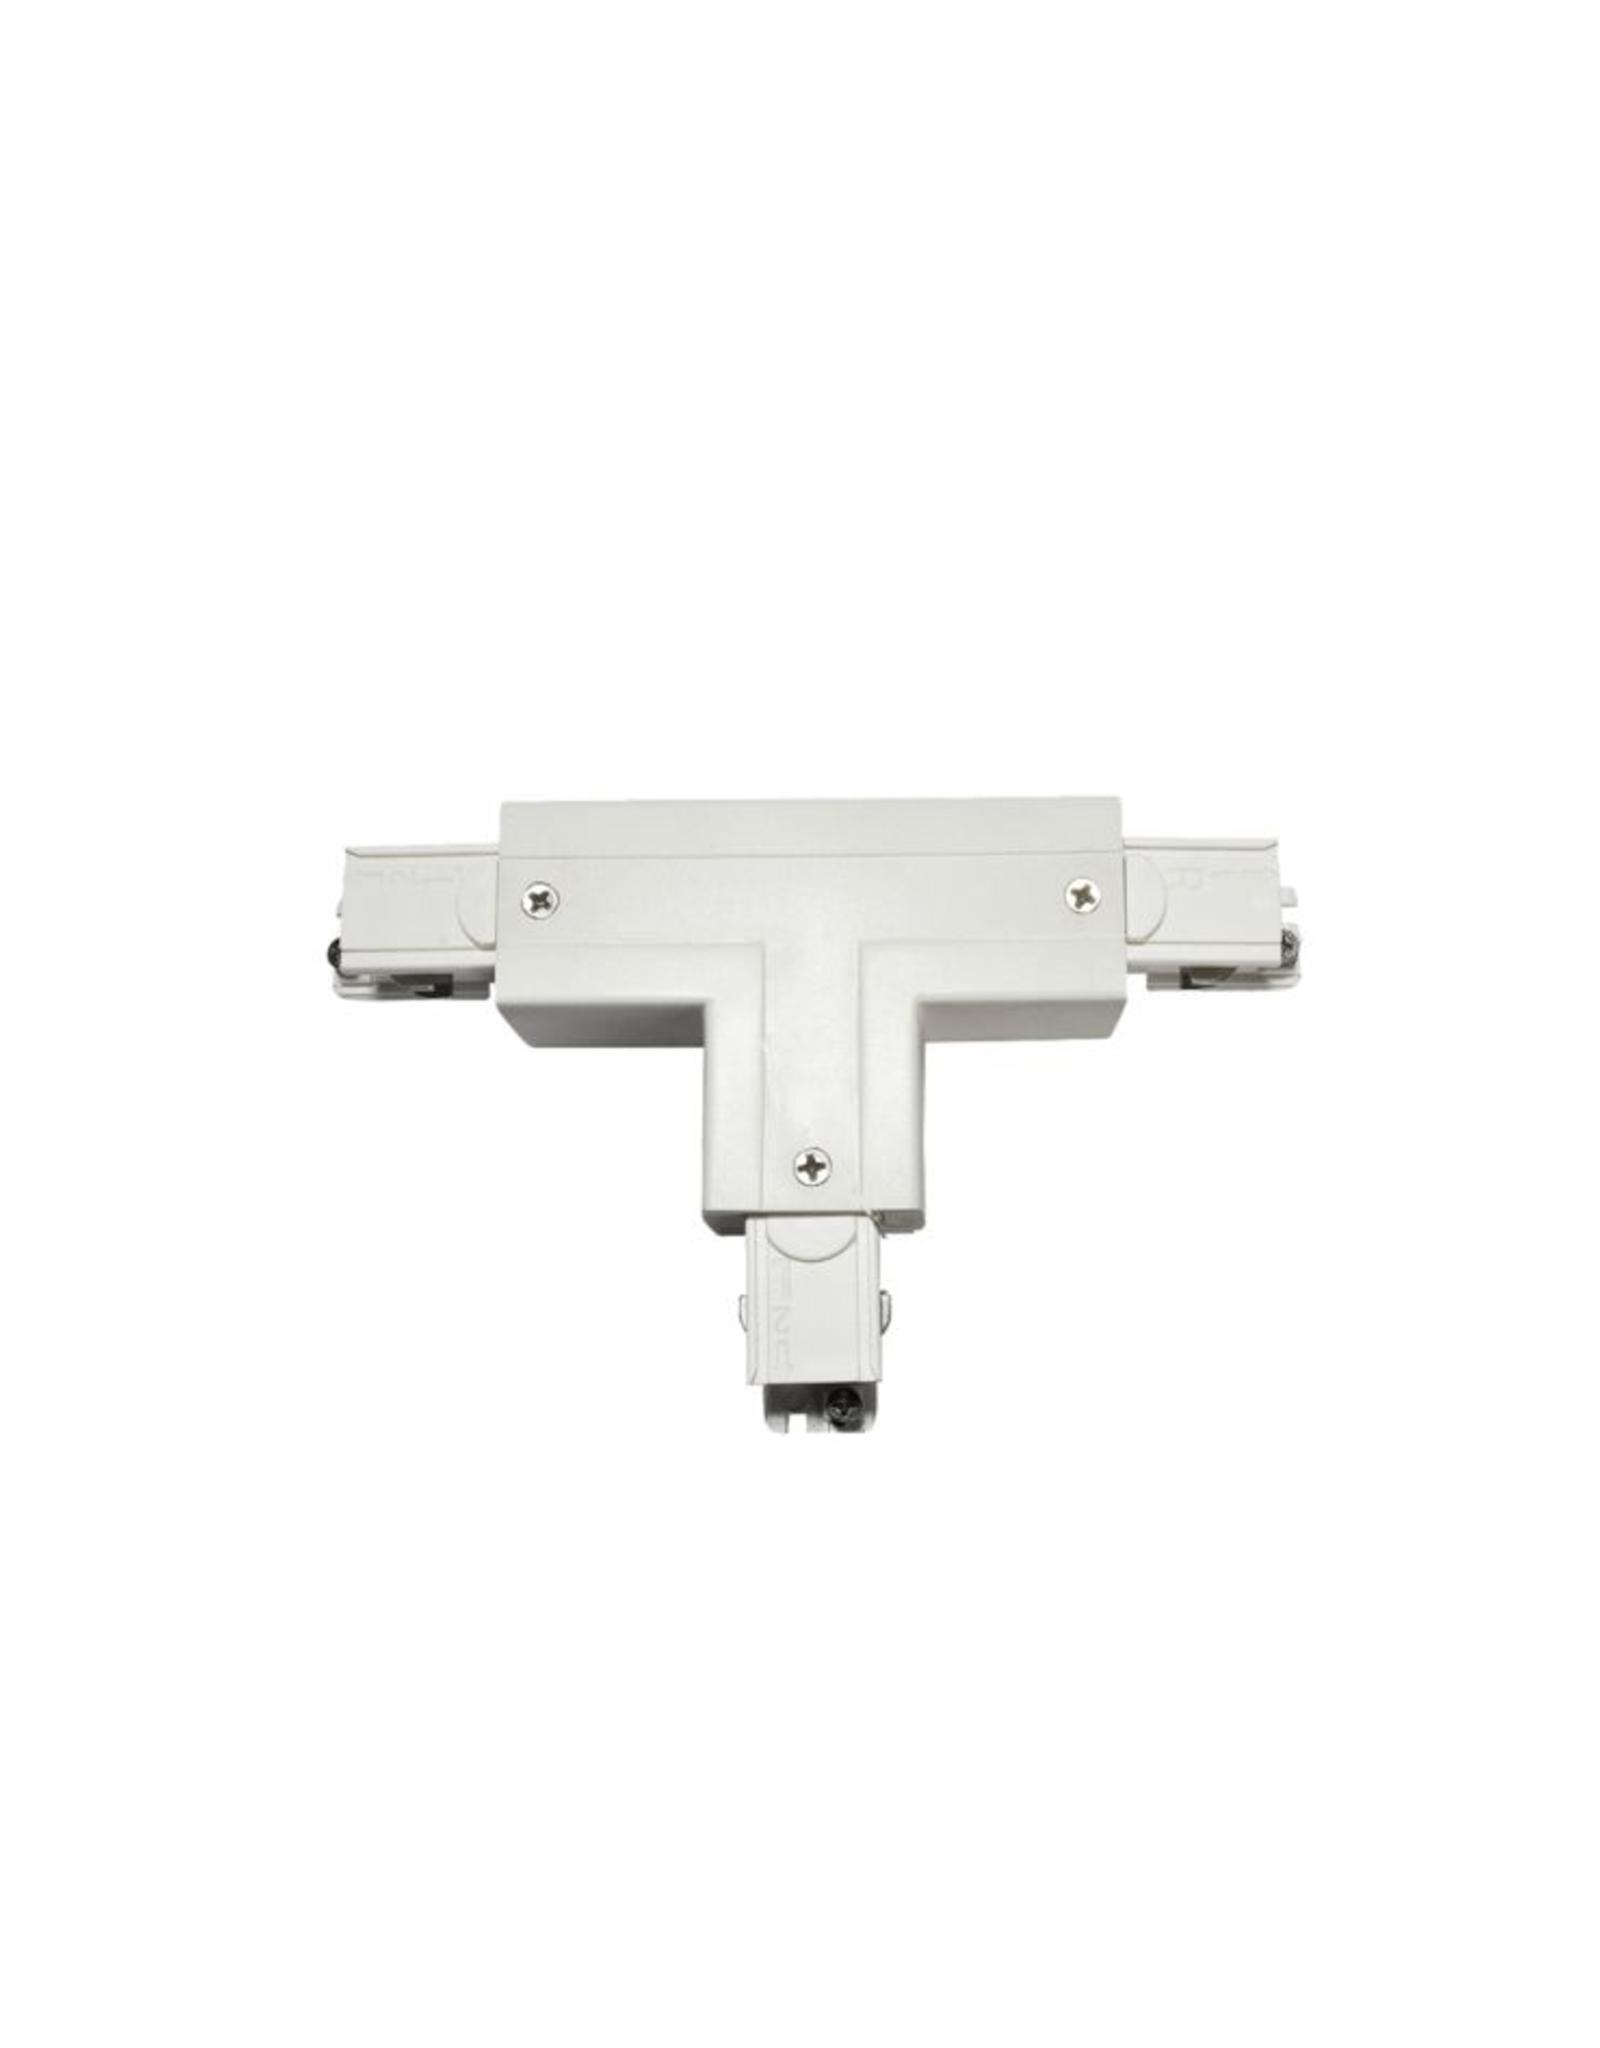 LED Tracklight verstelbaar t-stuk links